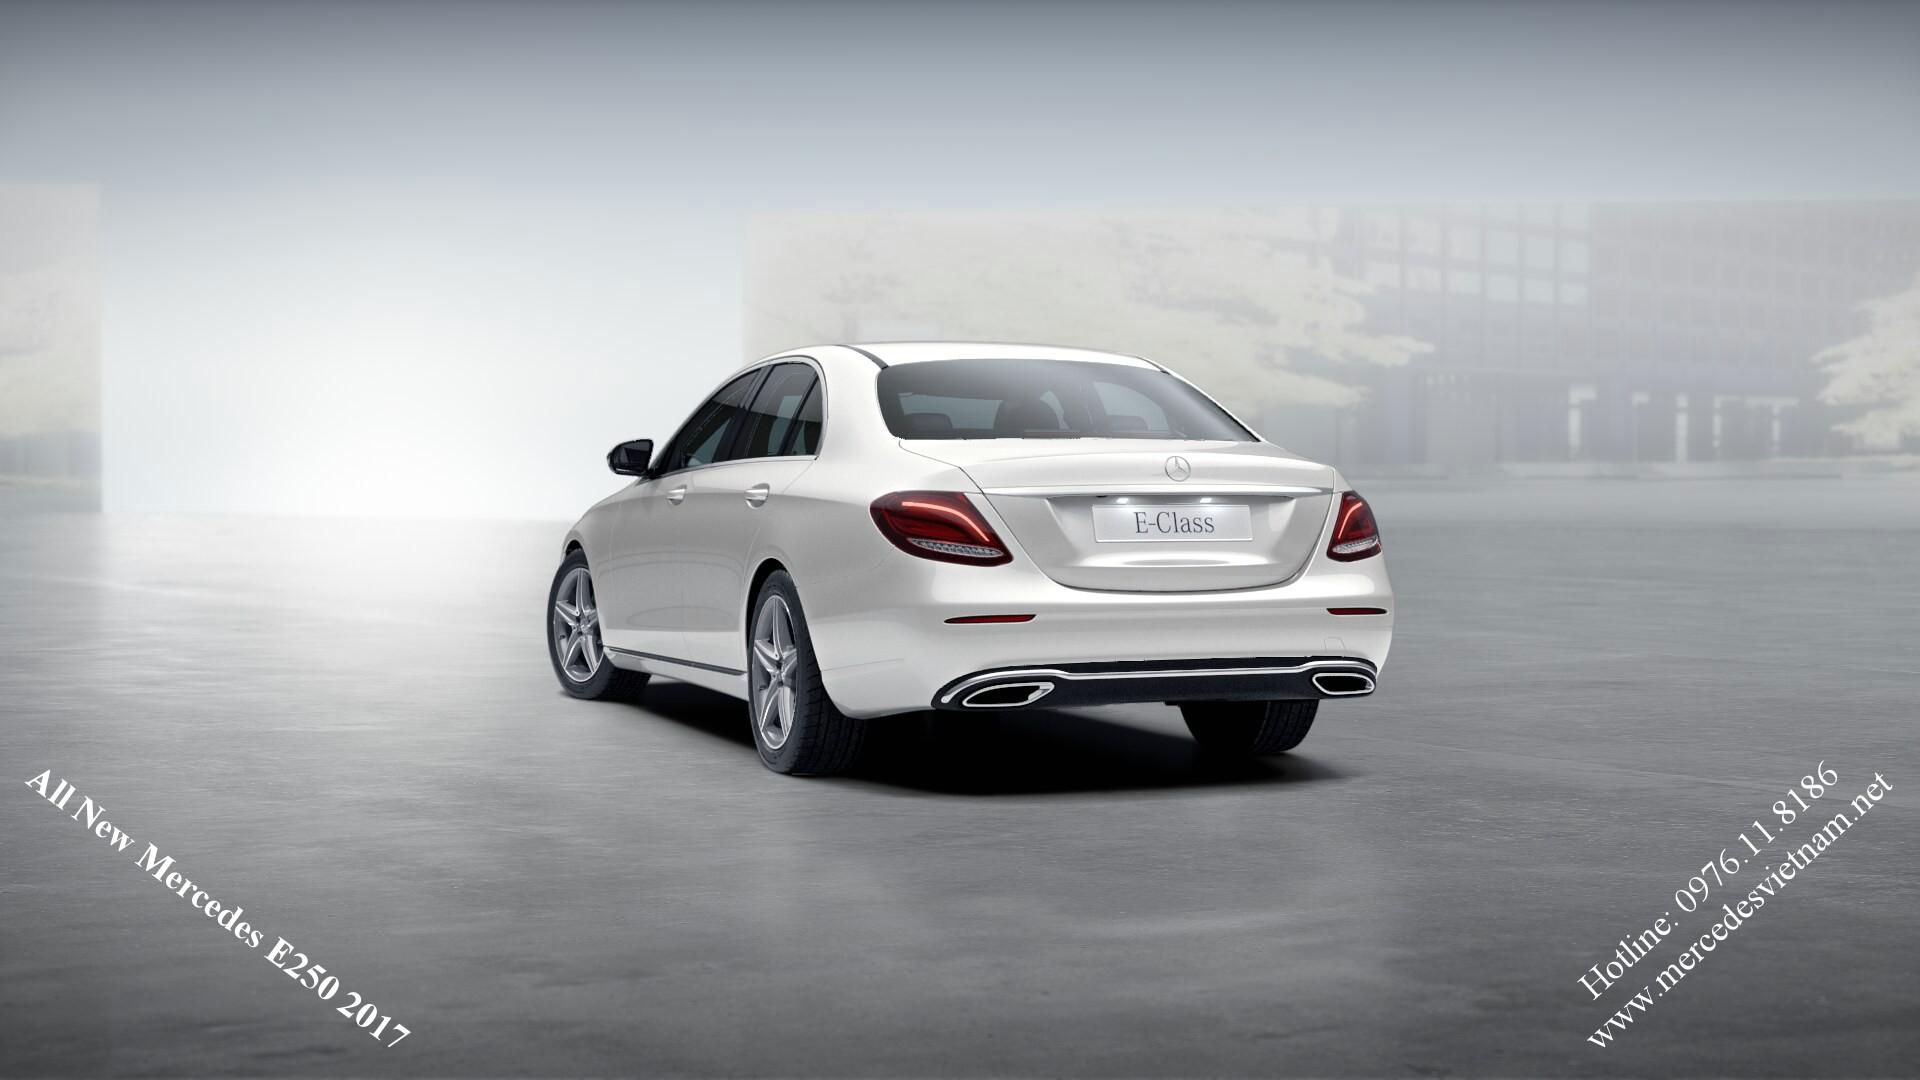 Mercedes E250 2017 (8)